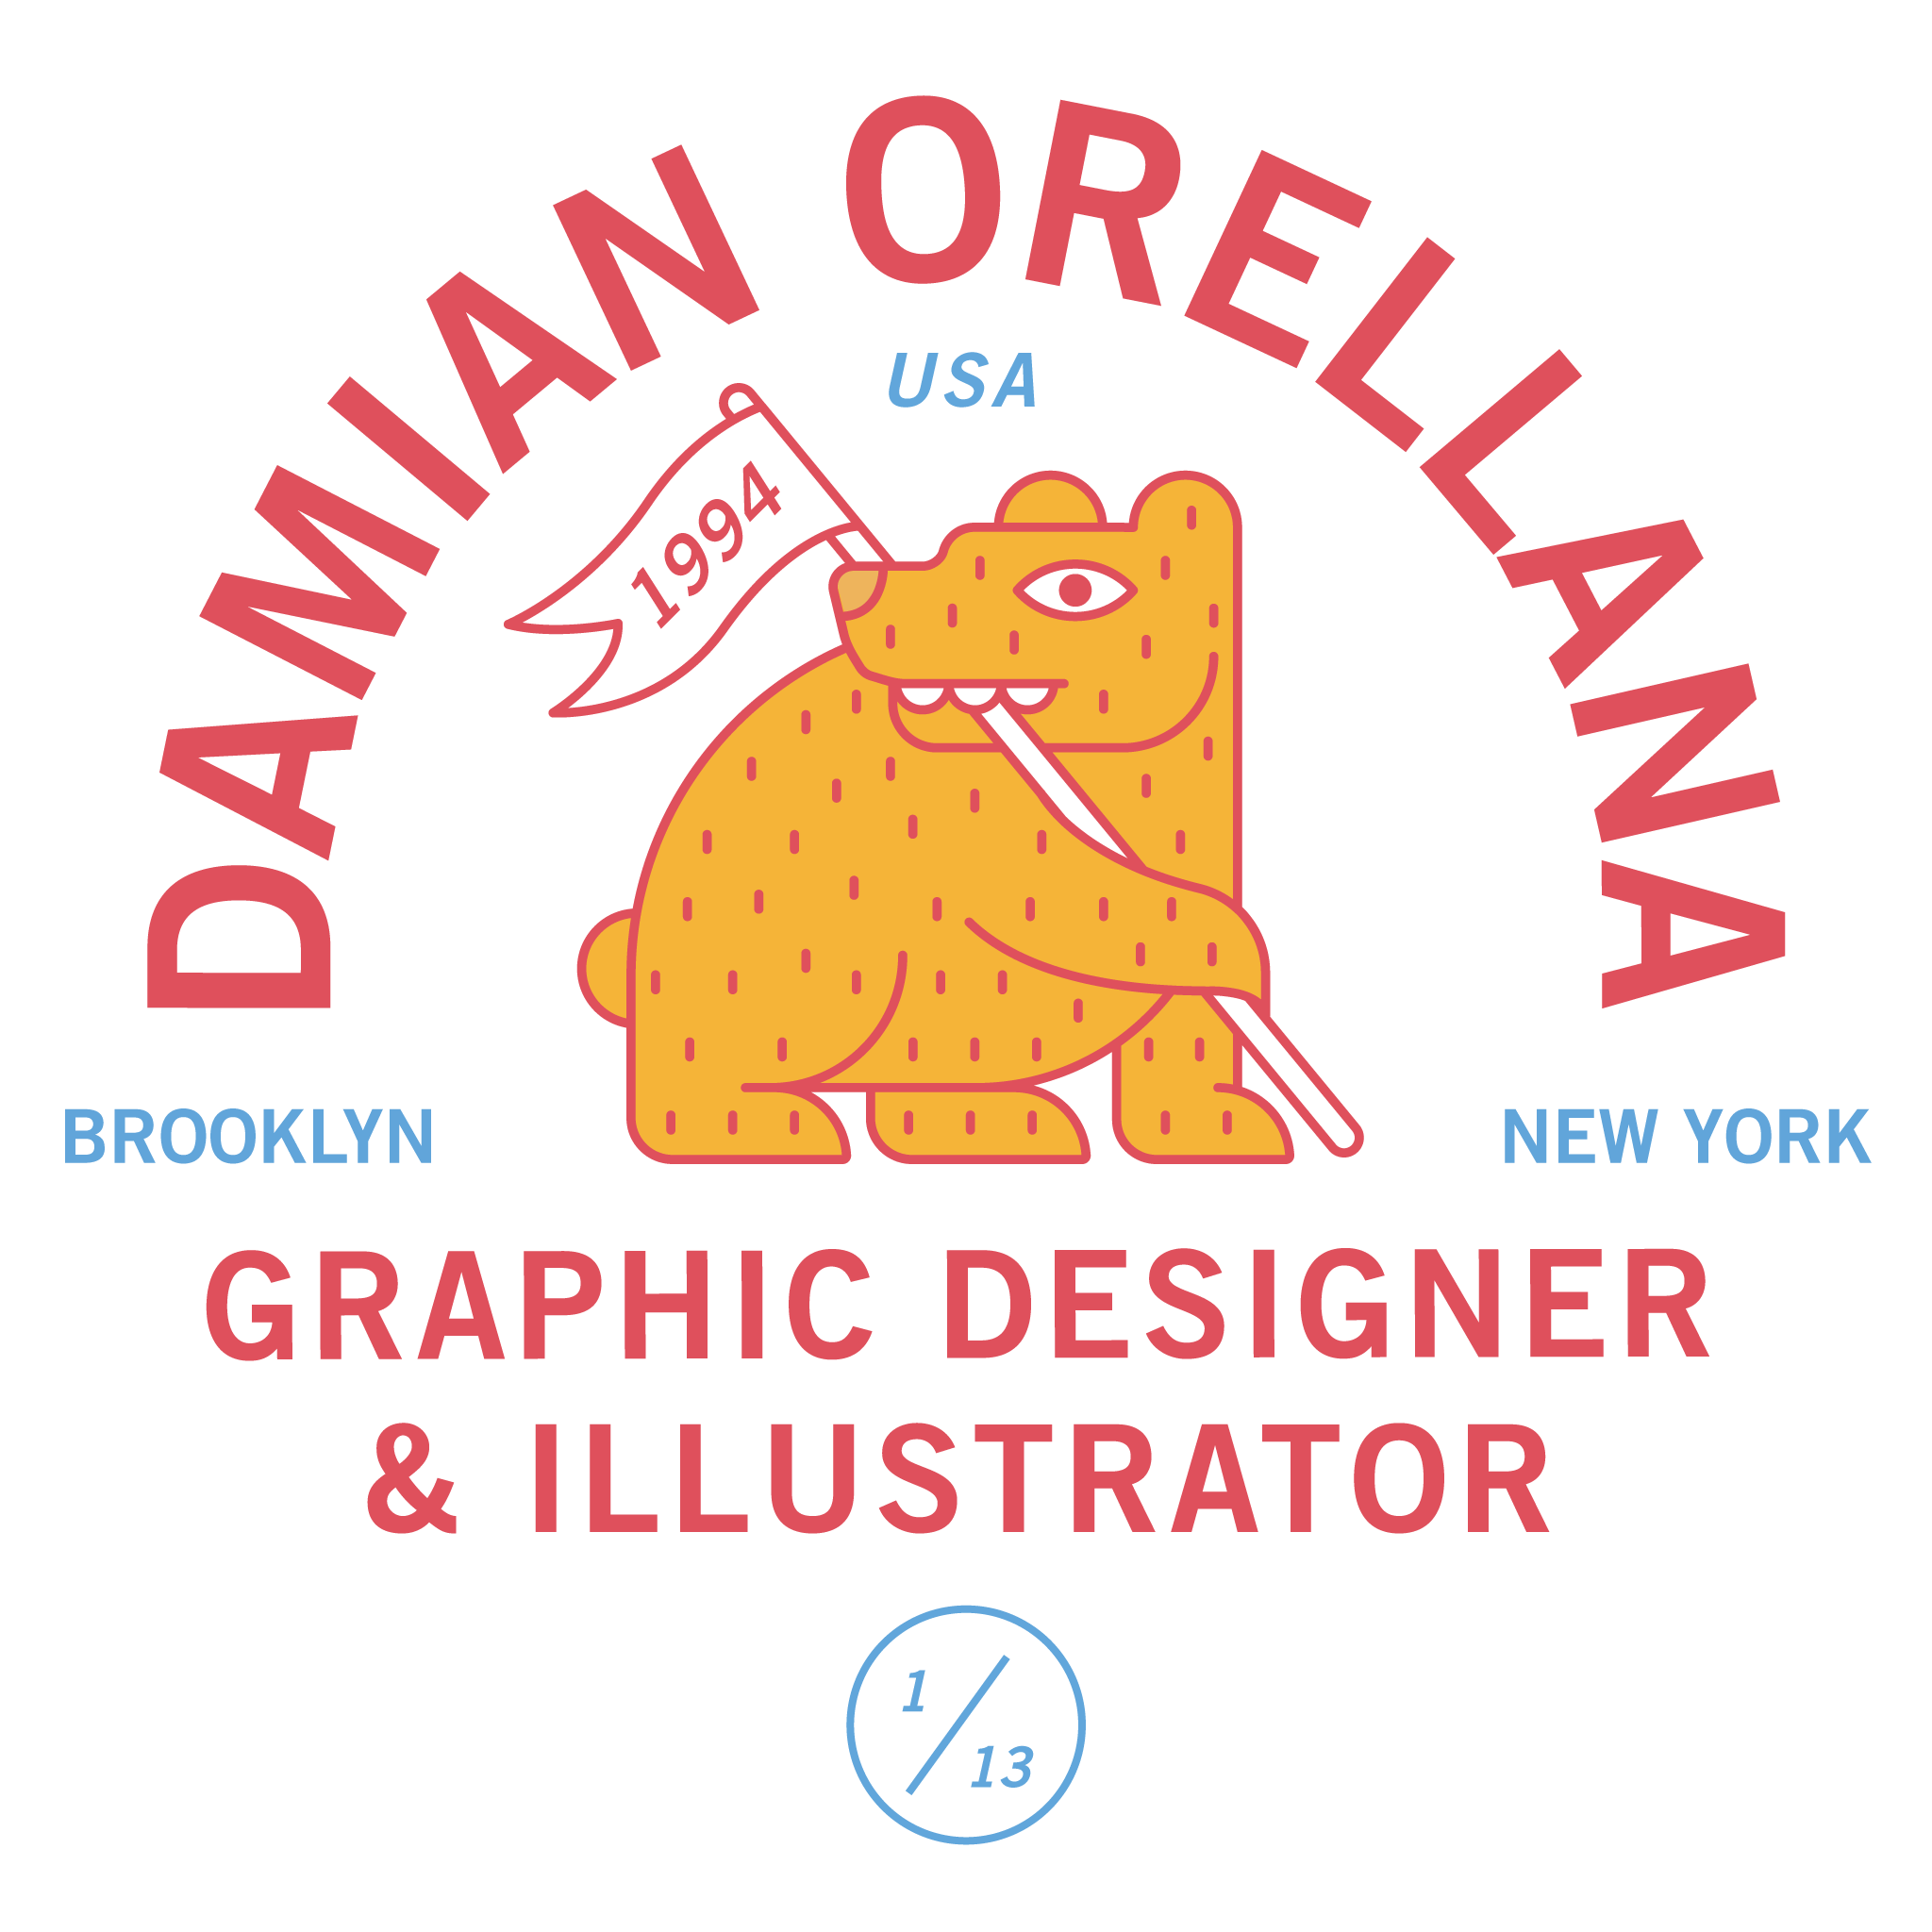 Damian Orellana